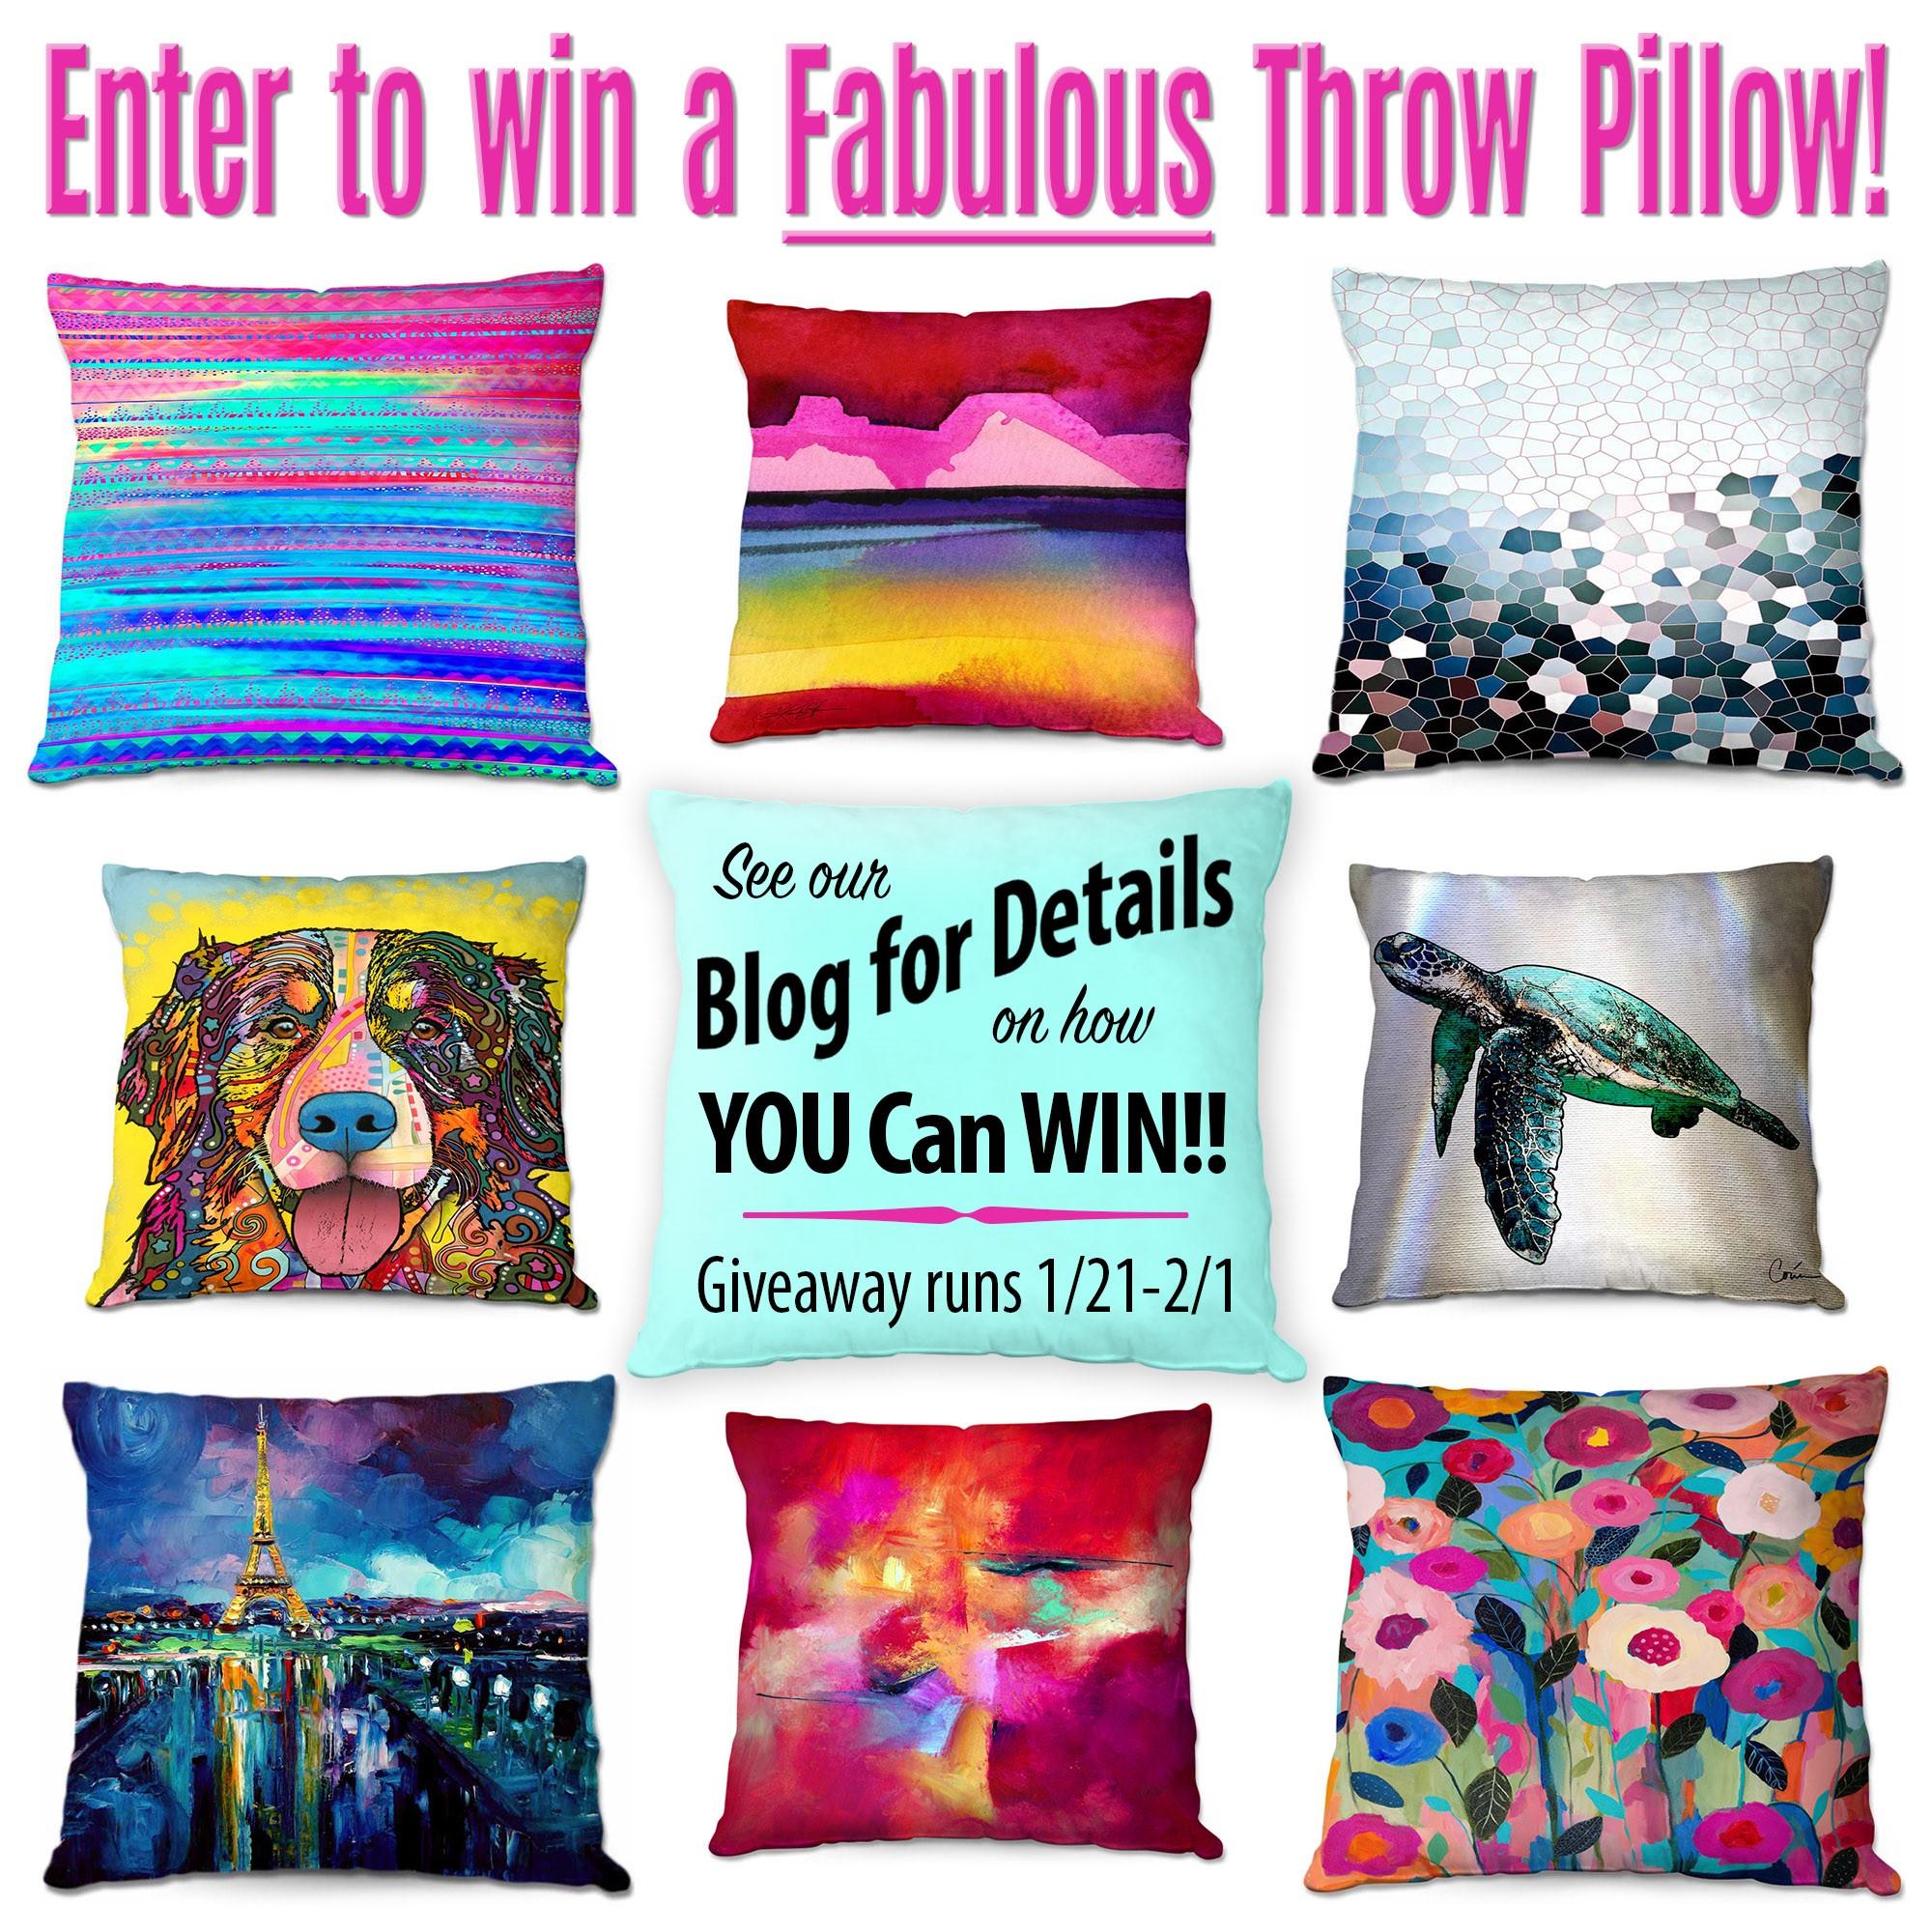 Pillow Give Away